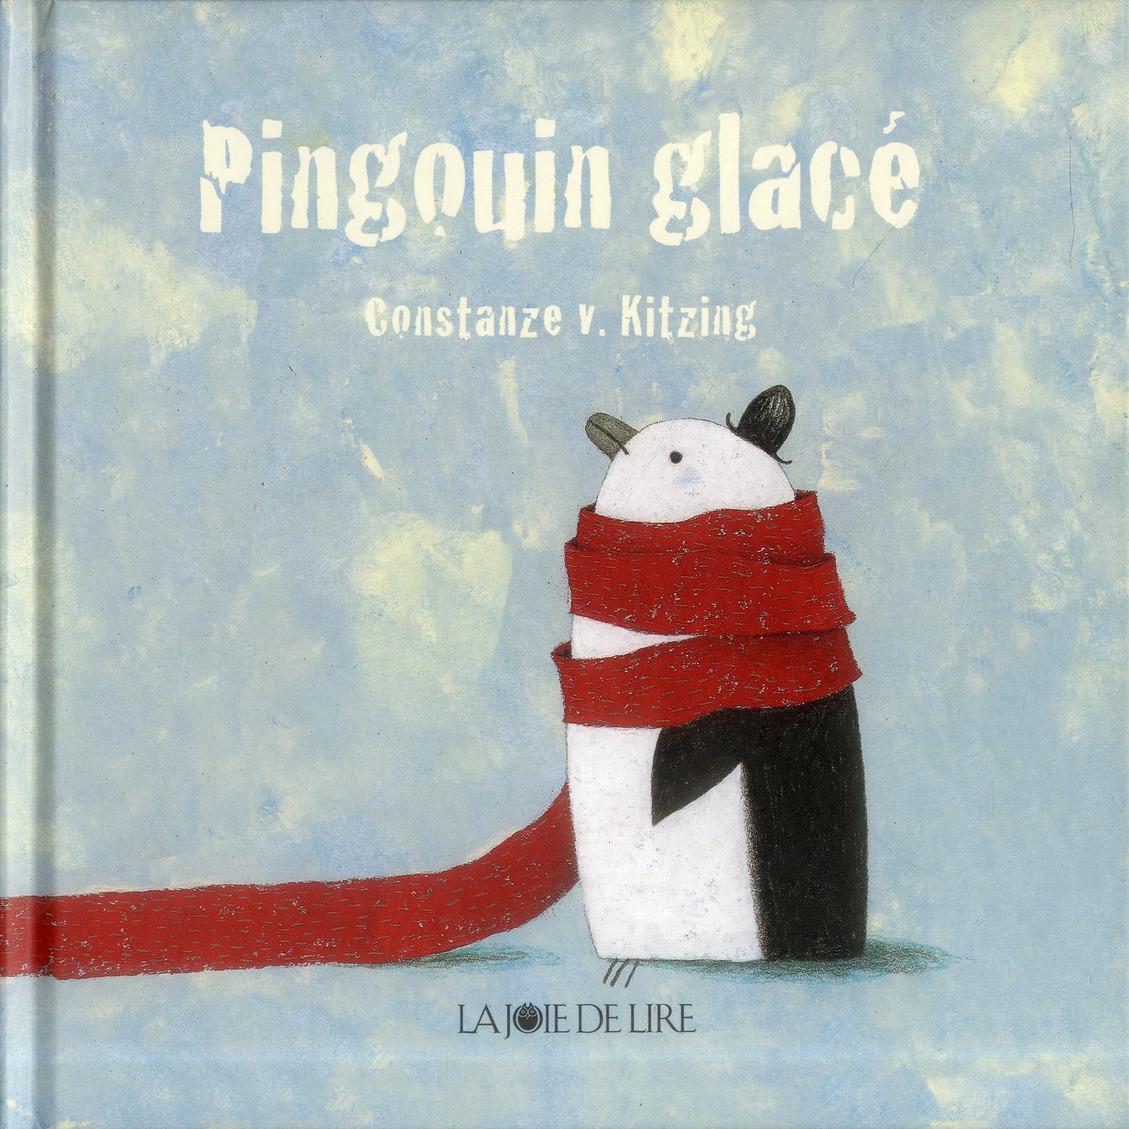 PINGOUIN GLACE